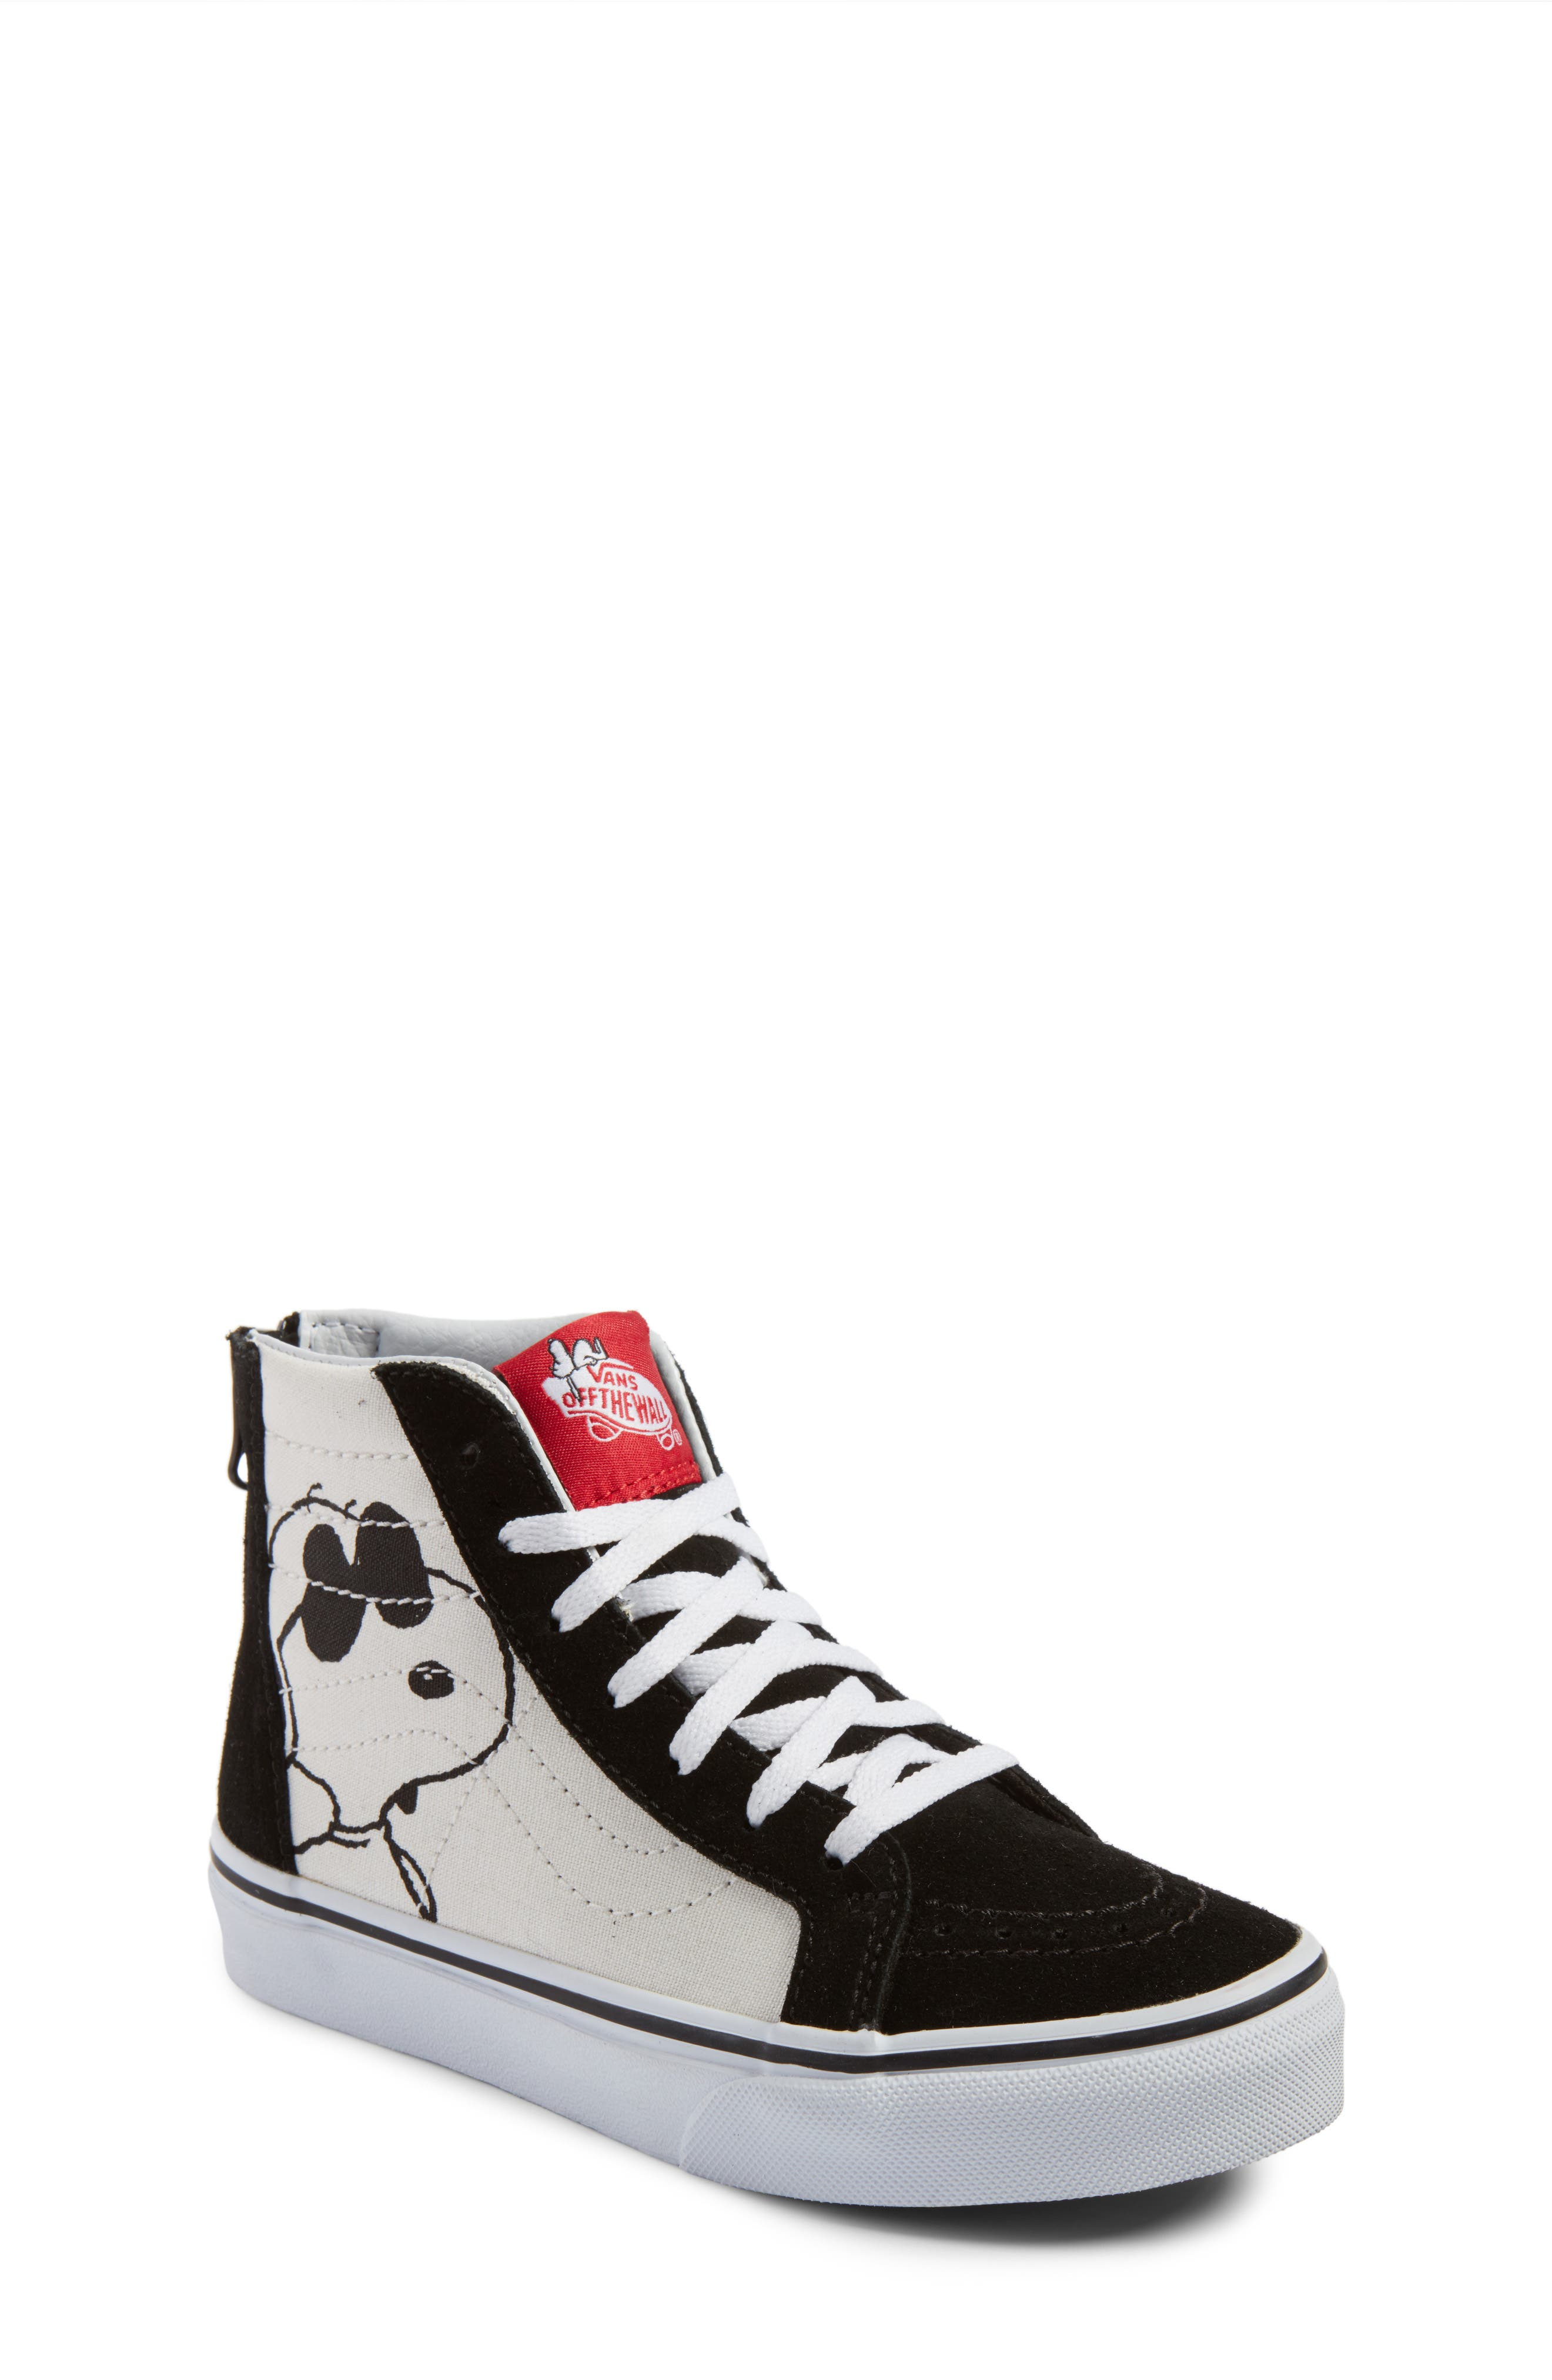 Main Image - Vans x Peanuts SK8-Hi Sneaker (Toddler, Little Kid & Big Kid)